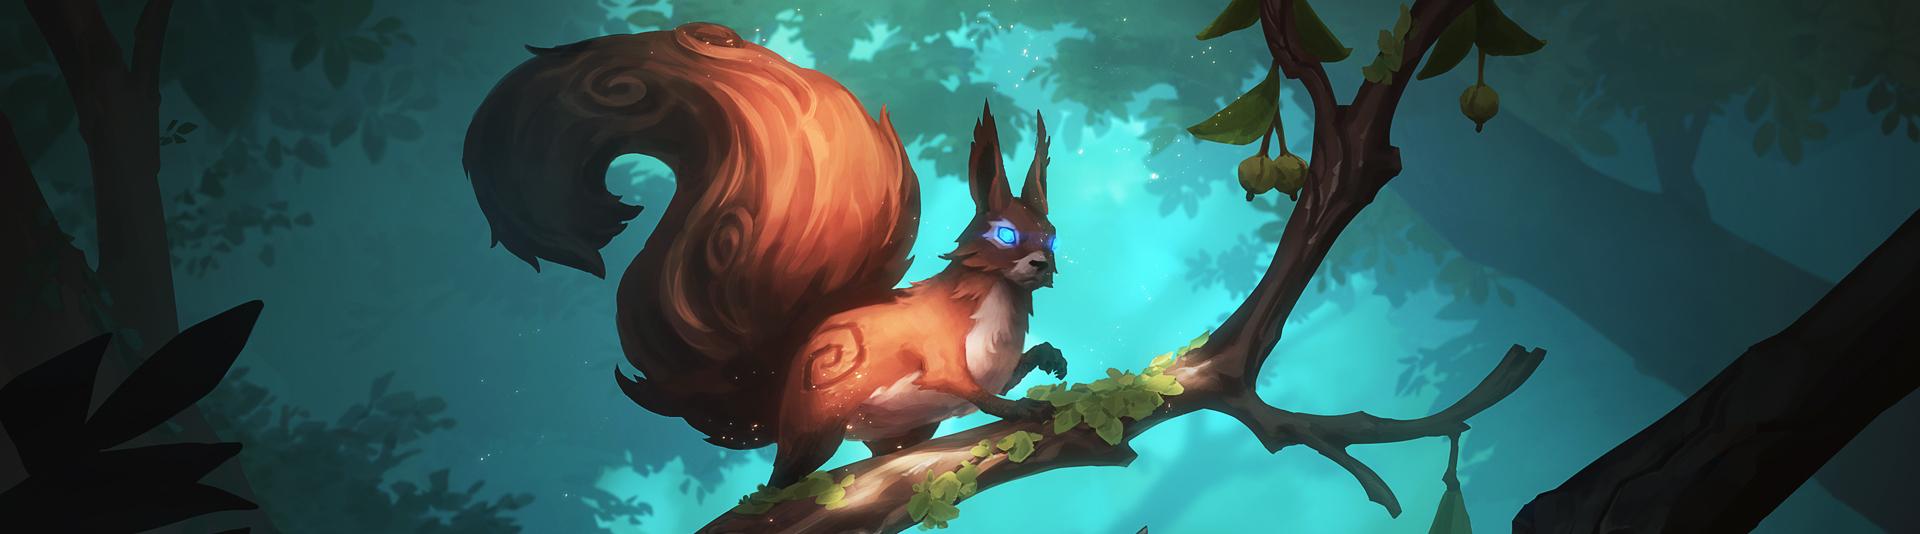 Northgard Clan of the Squirrel DLC